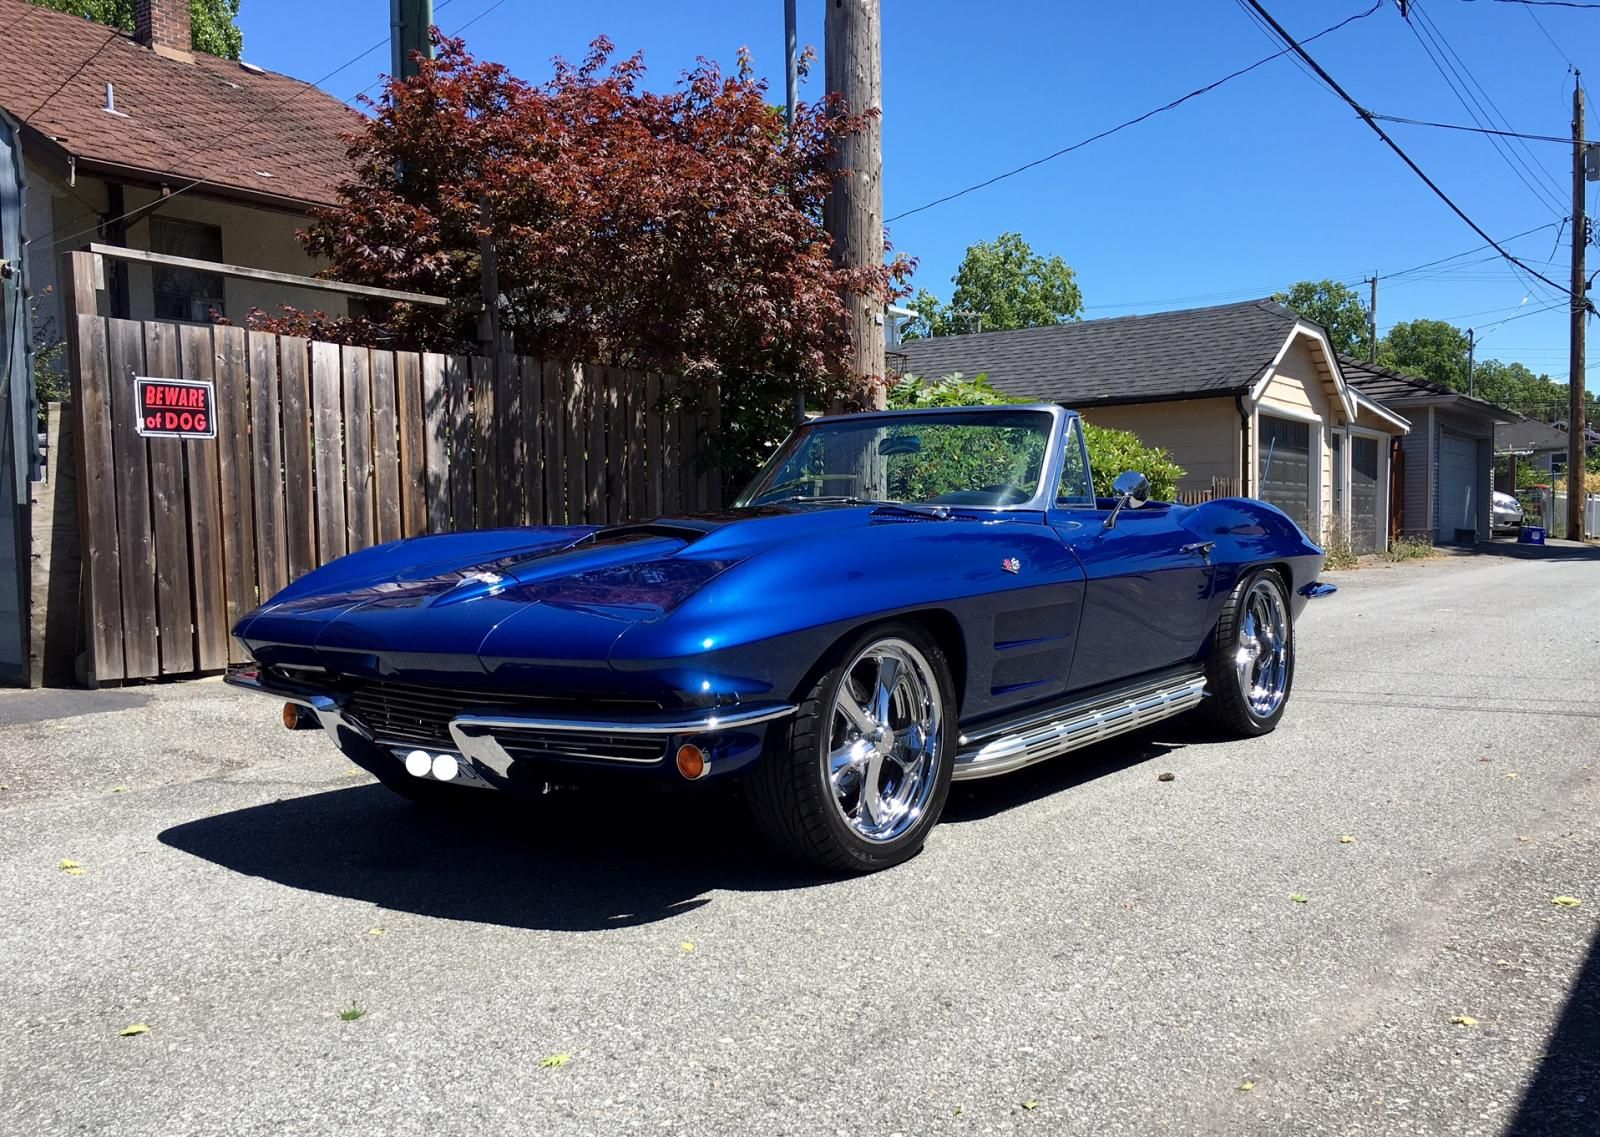 C2 Corvette For Sale >> 1964 Corvette Stingray Convertible Restomod Frame Off